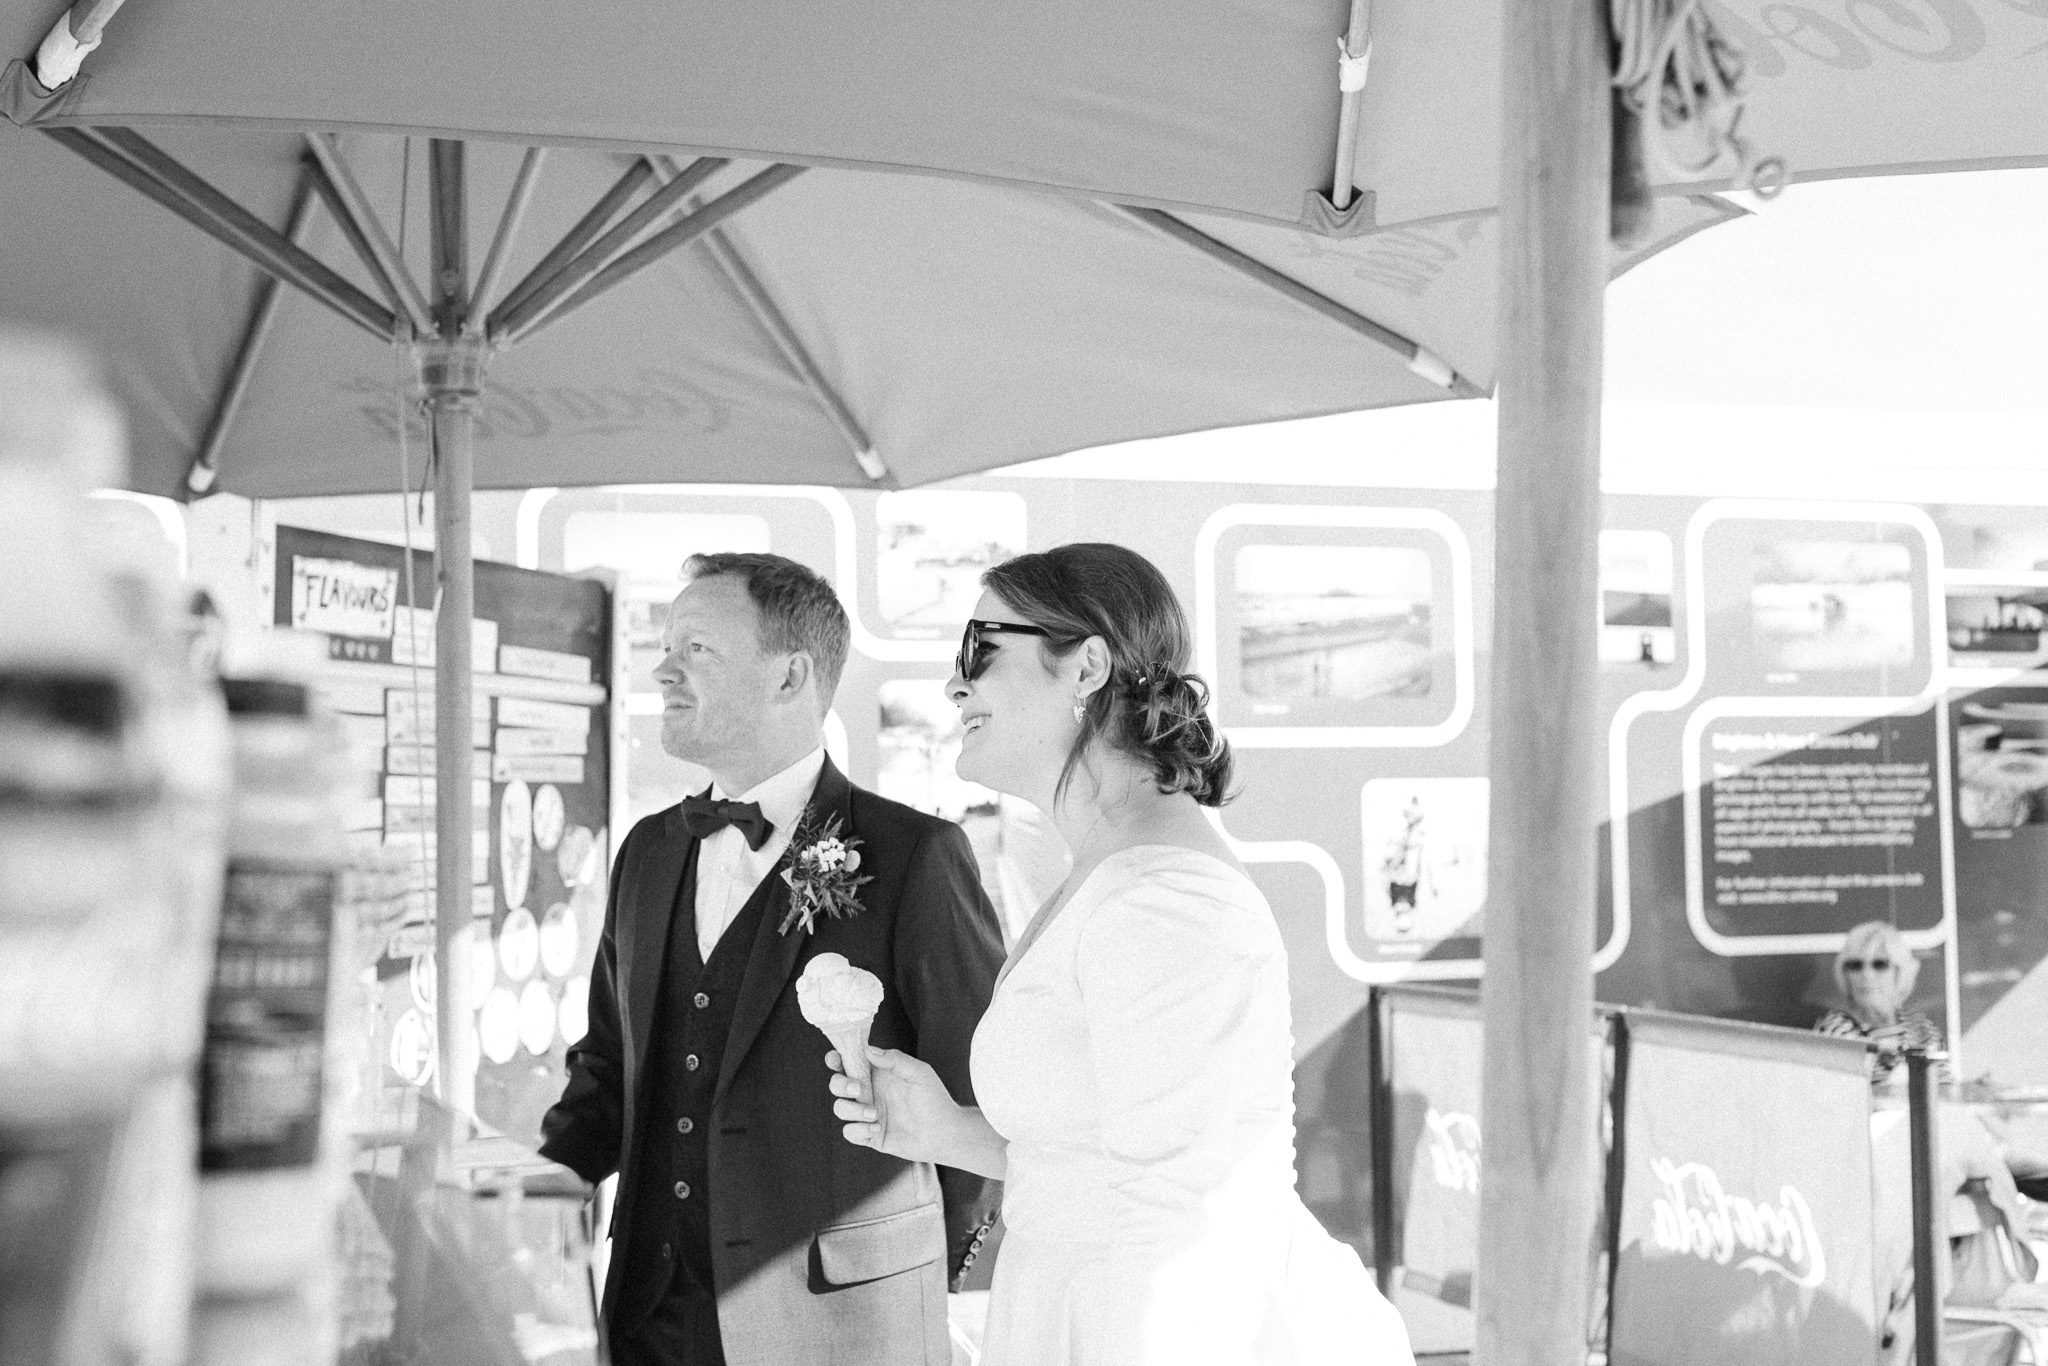 st_andrews_fabrica_brighton_wedding_594.jpg